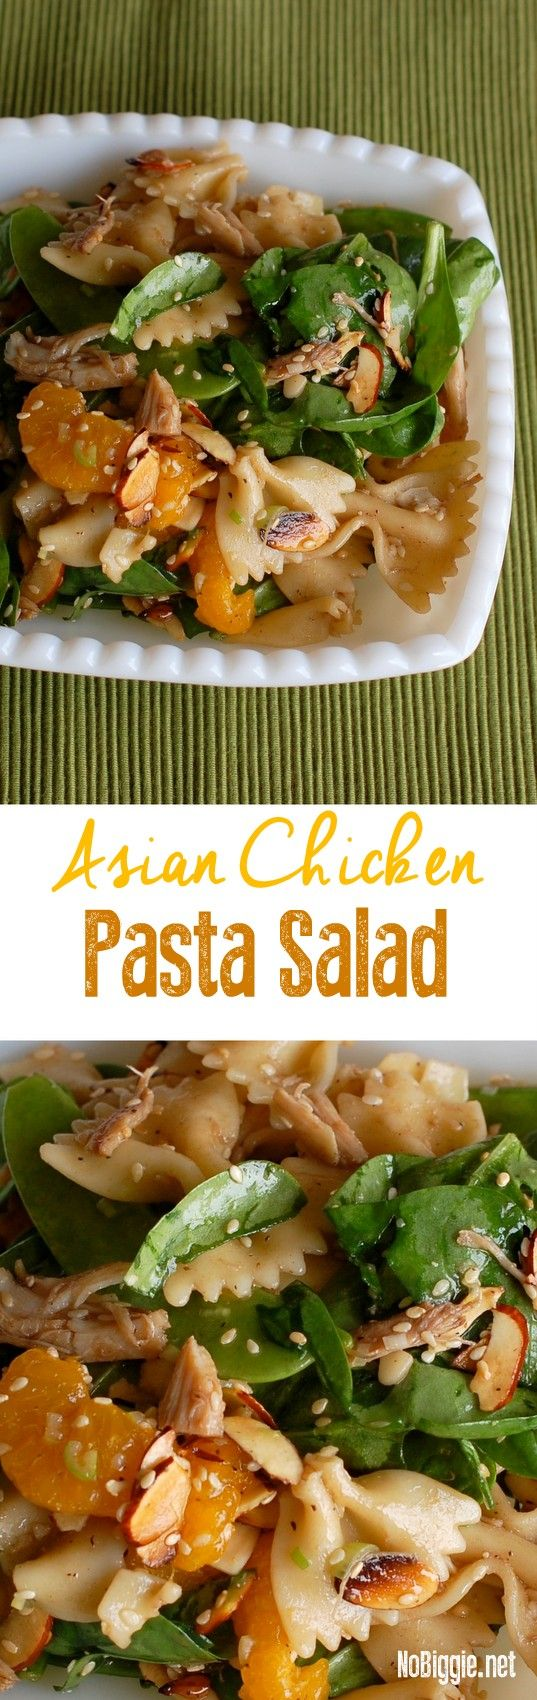 Asian Chicken Pasta Salad - amazing salad for big gatherings | NoBiggie.net